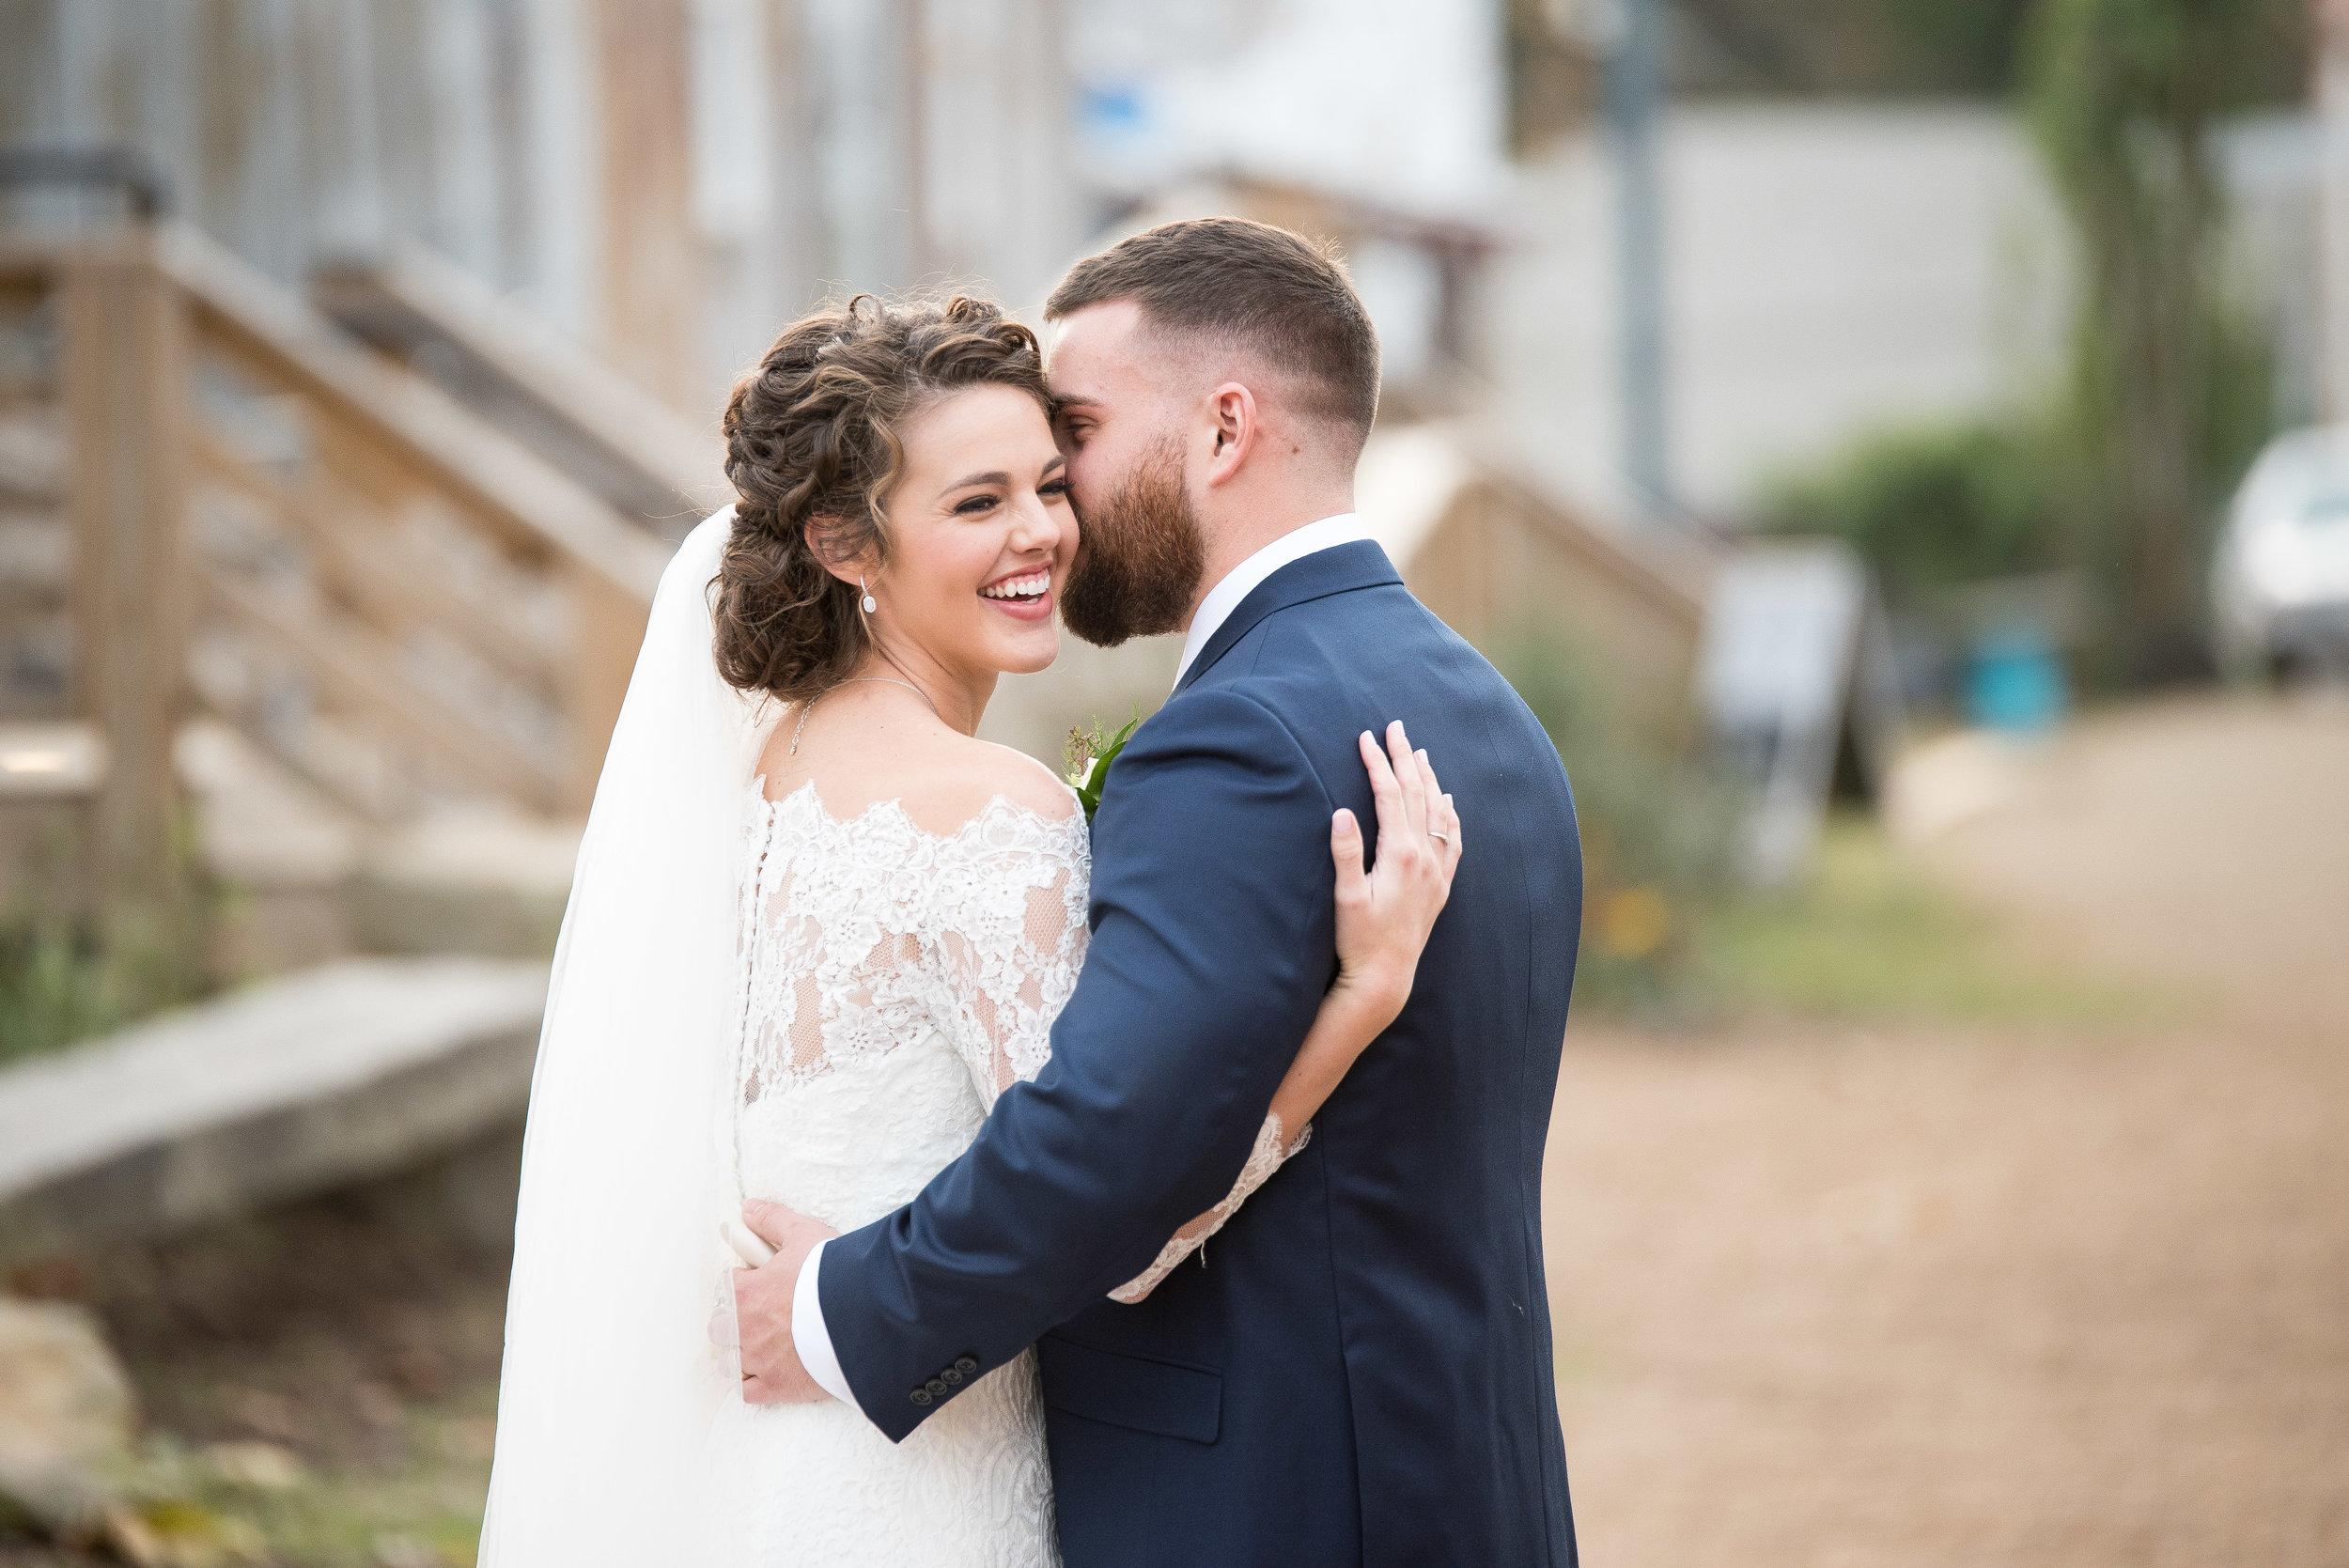 The Roller Mill Events - Winston Salem Weddings - NC Weddings - High Point NC Weddings - Winston Salem Venue - Yasmin Leonard Photography-52.jpg